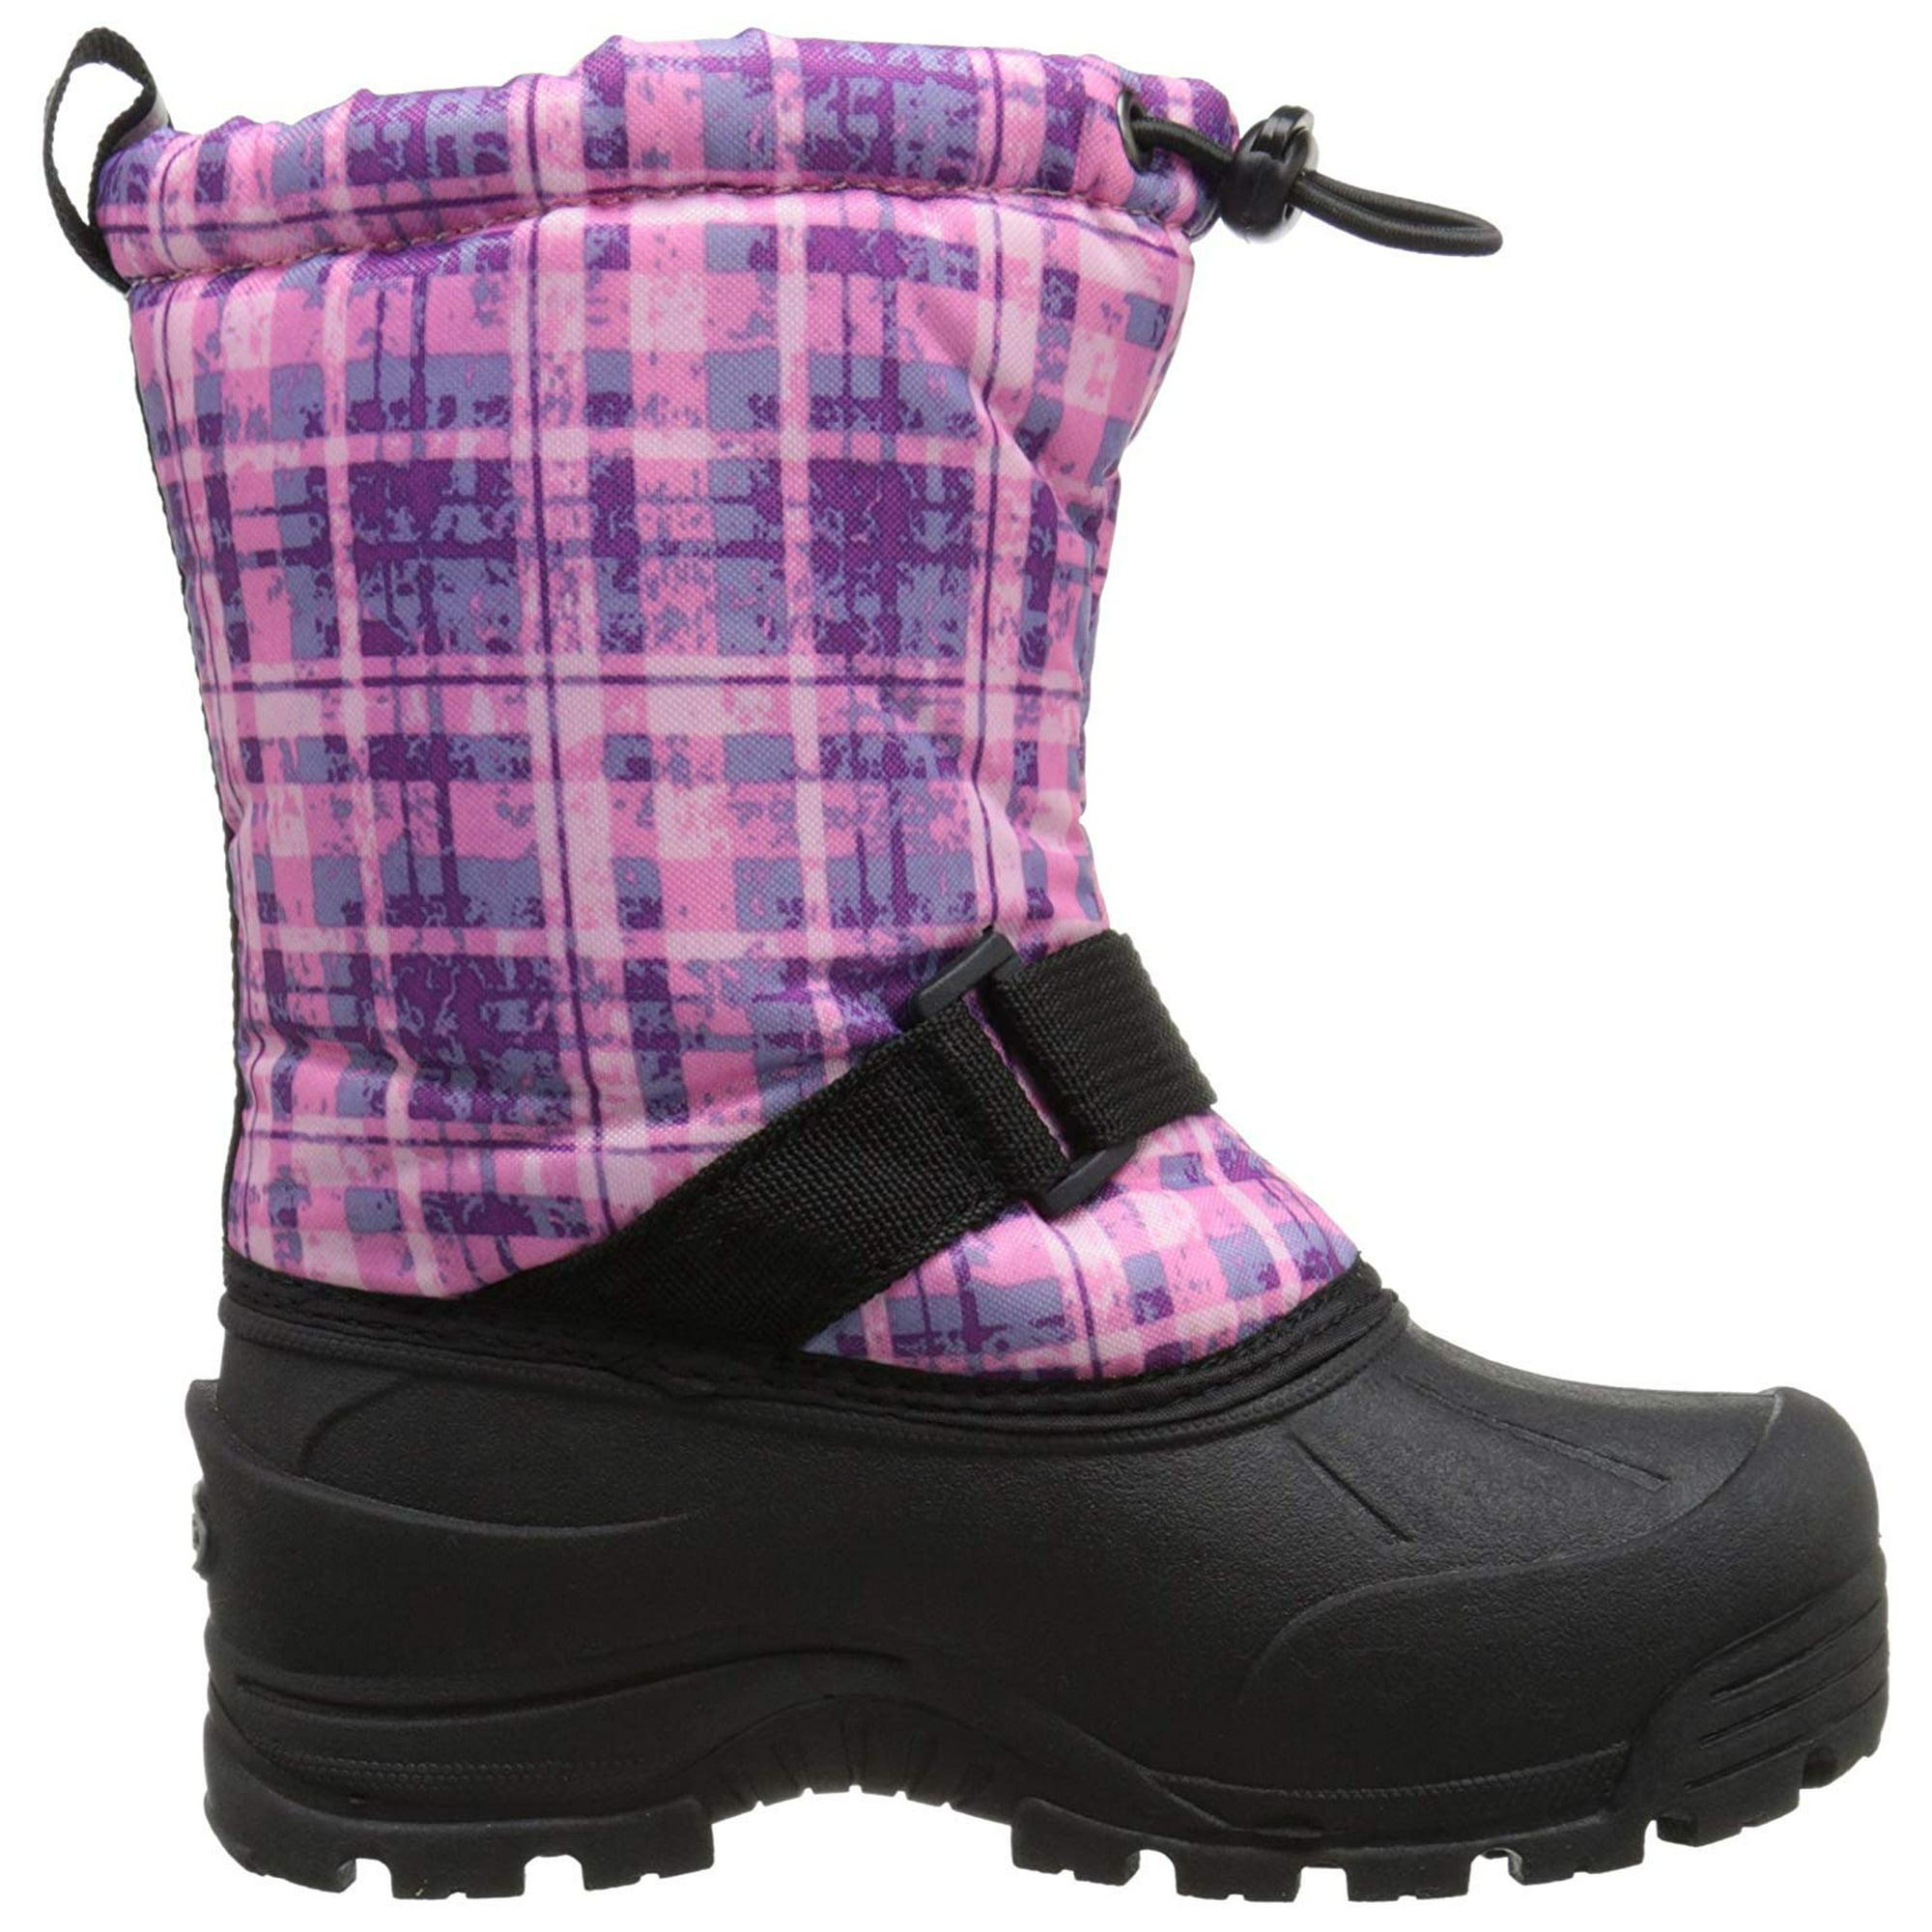 BootsWalmart Mid Snow On Canada Northside Frosty Girls Calf Pull F1lTJcK3